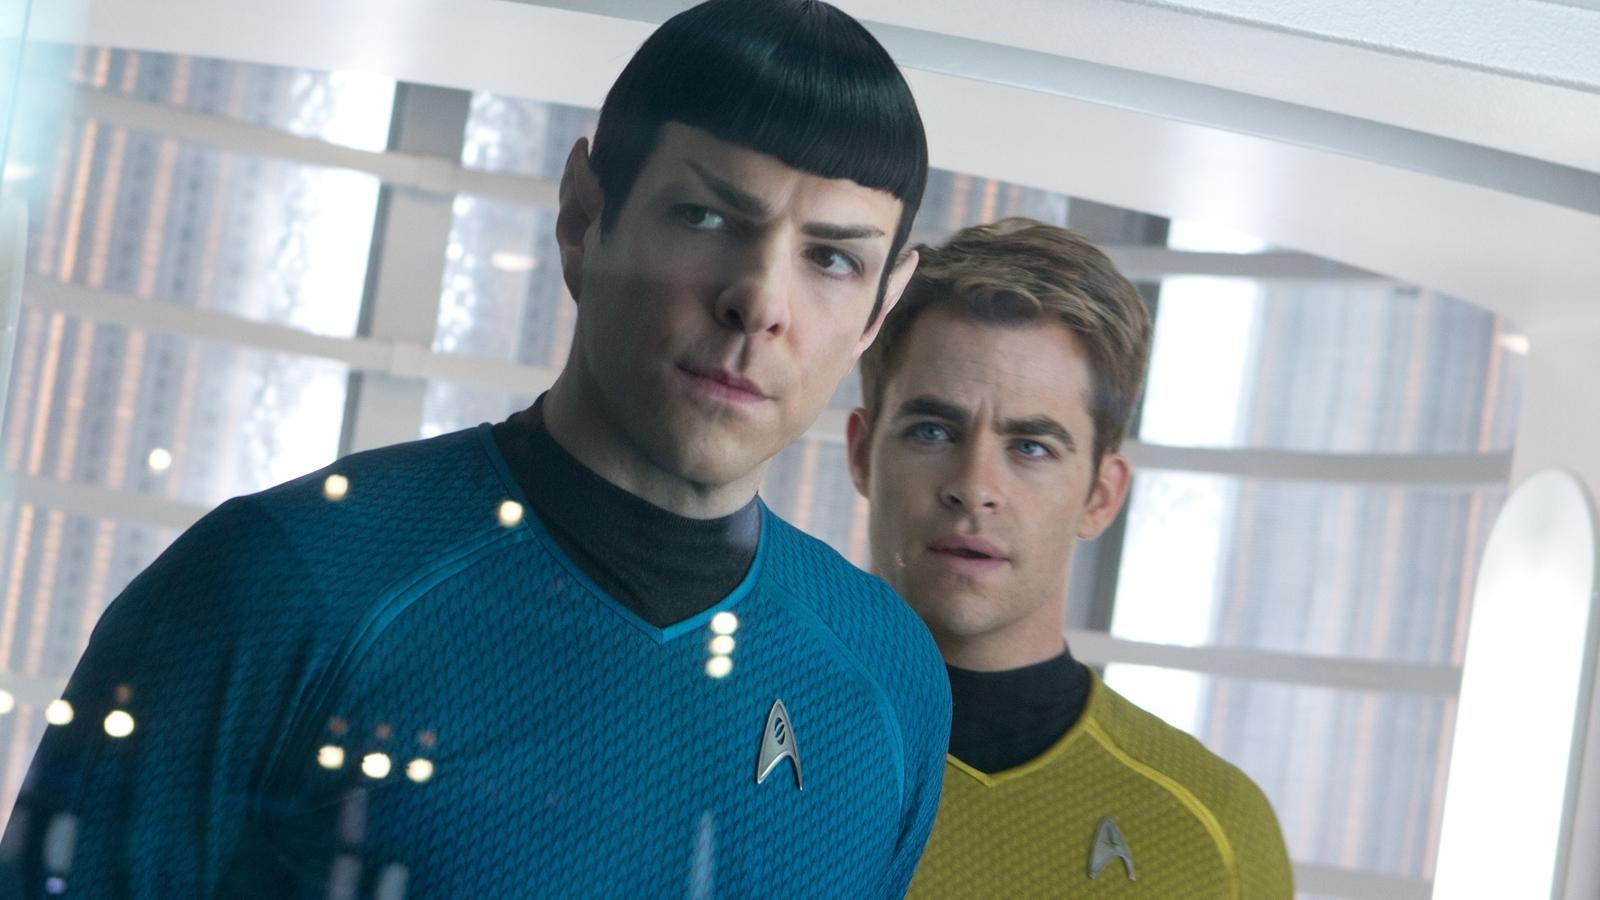 Star Trek Zachary Quinto